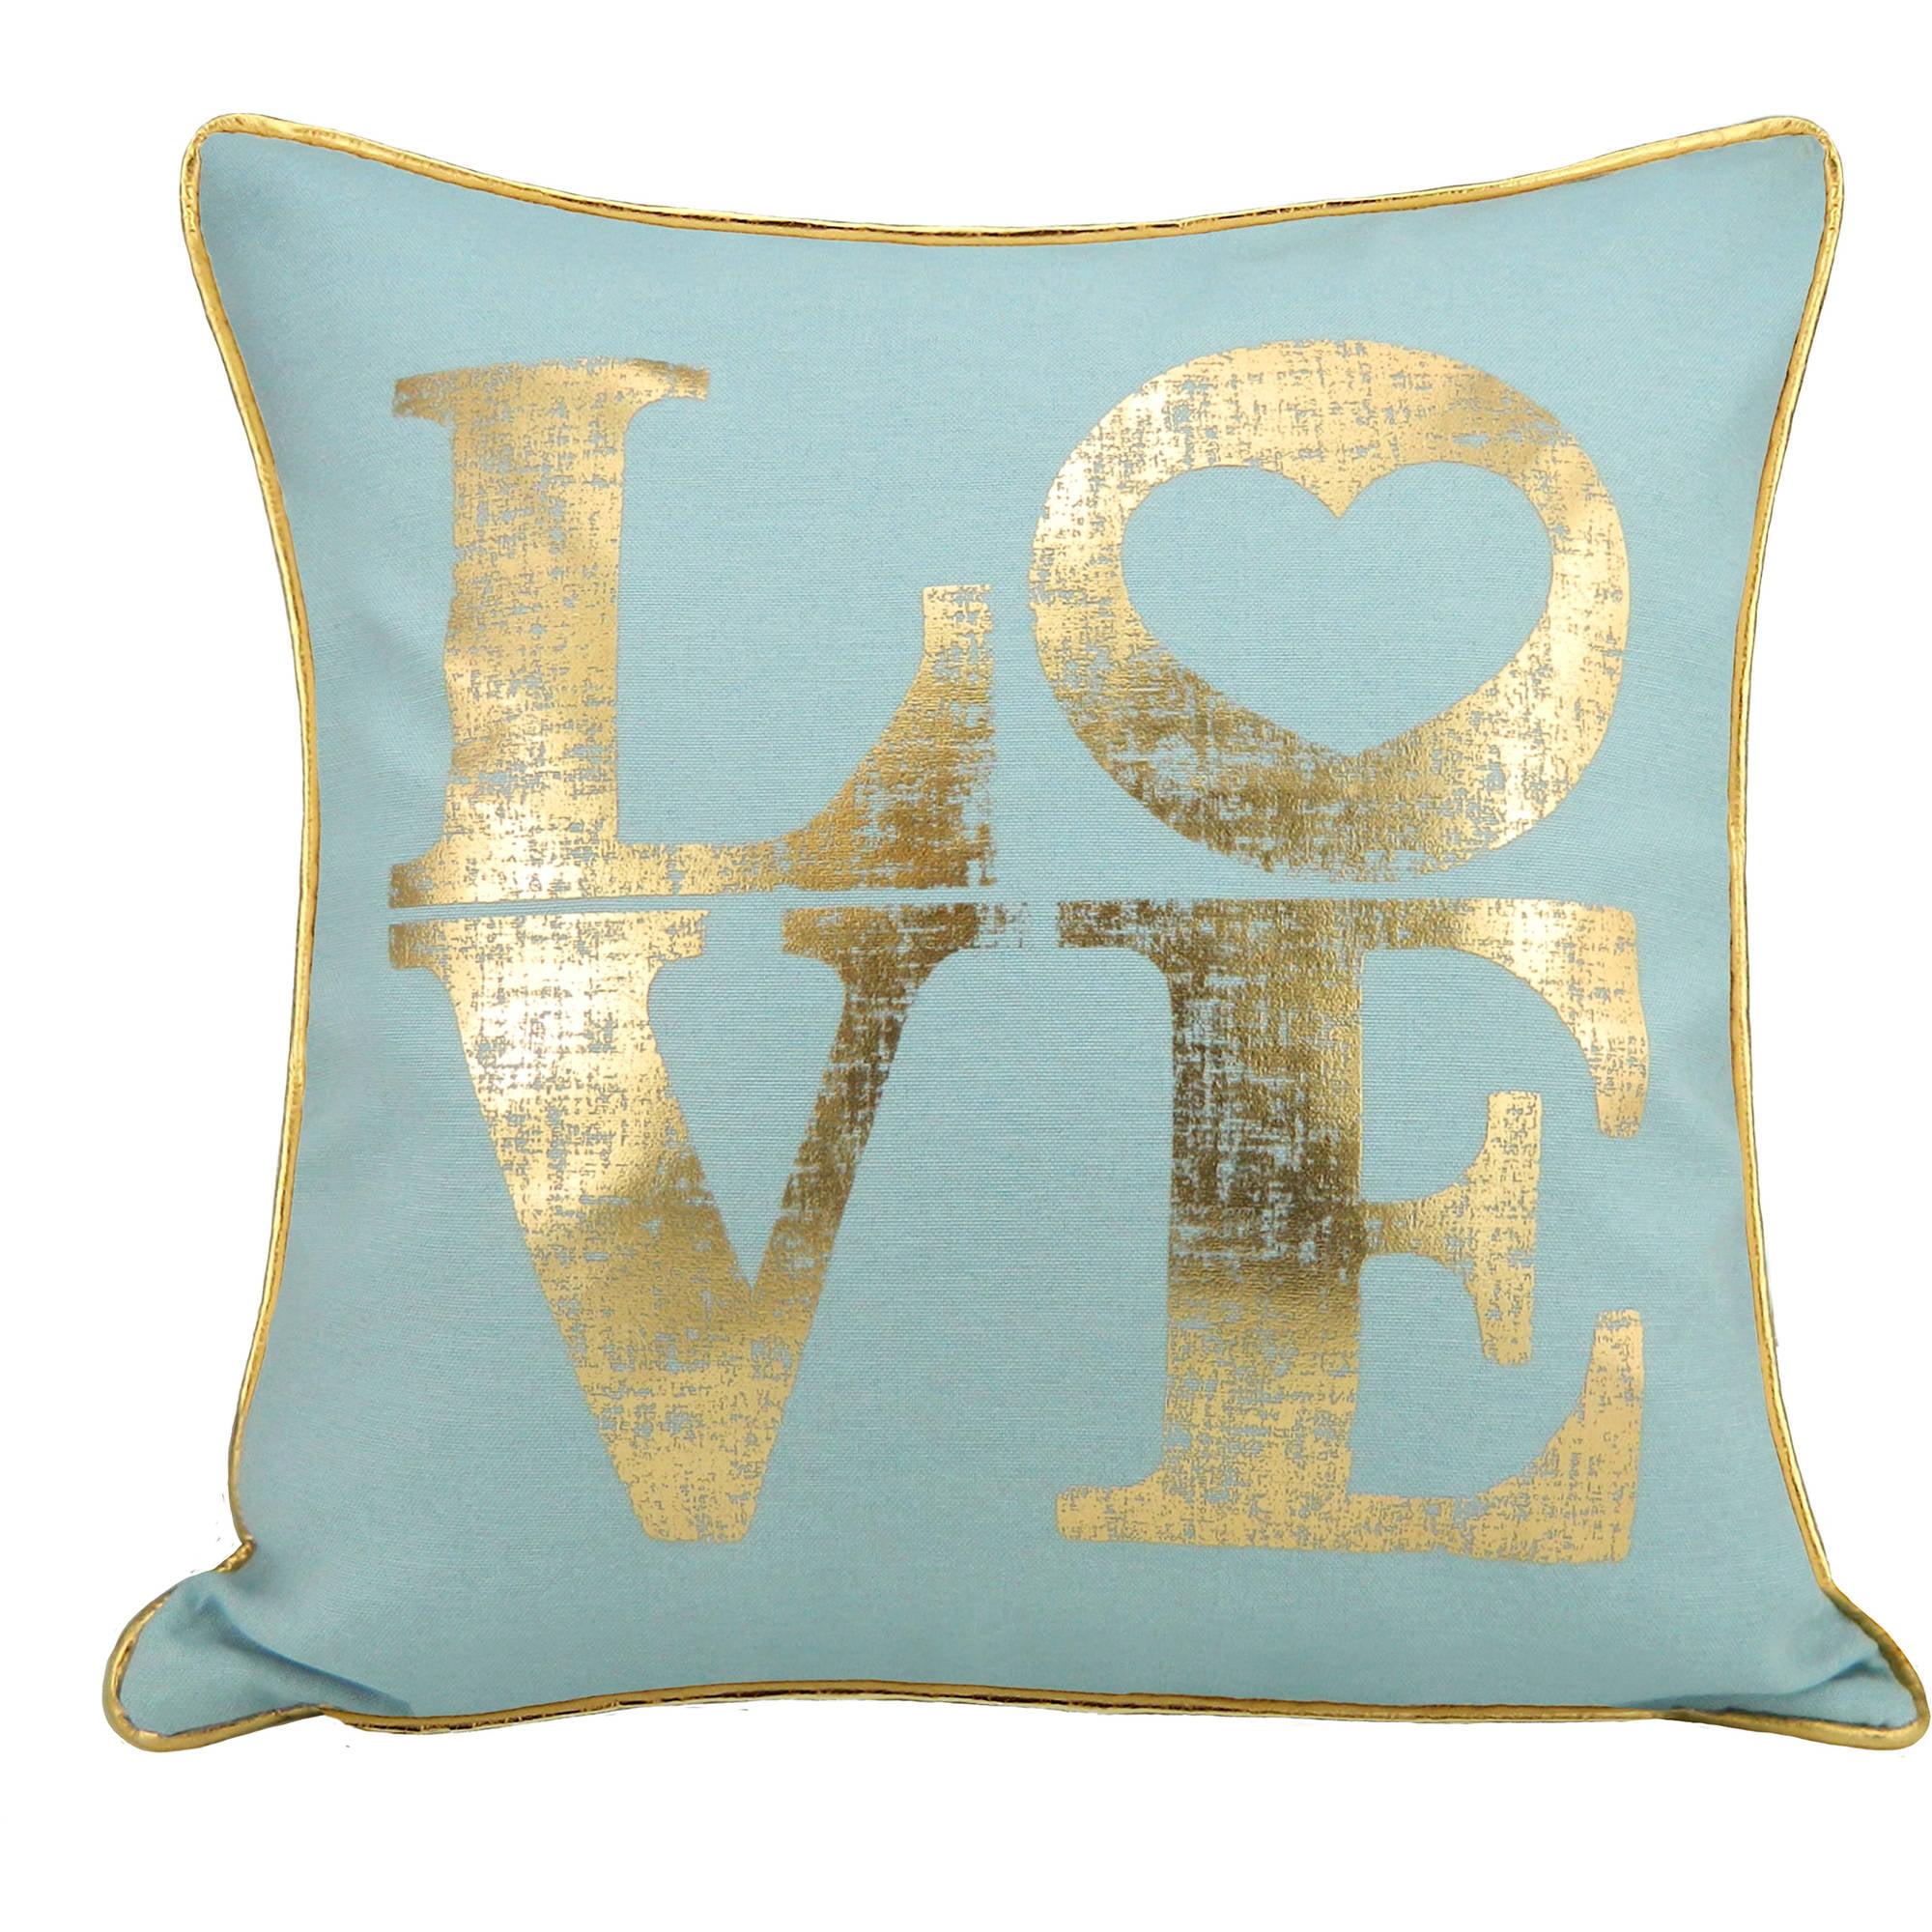 textiles indian pillows trellis kalamkari f pillow at furniture master collectibles sale for more id throws